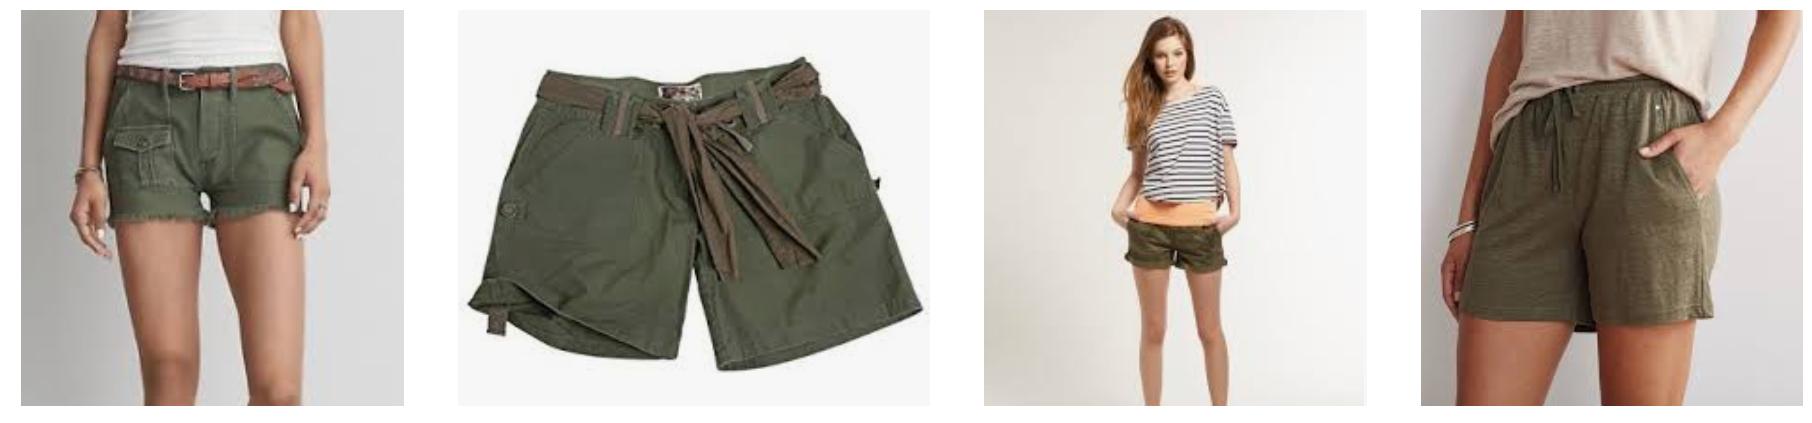 olive shorts.PNG